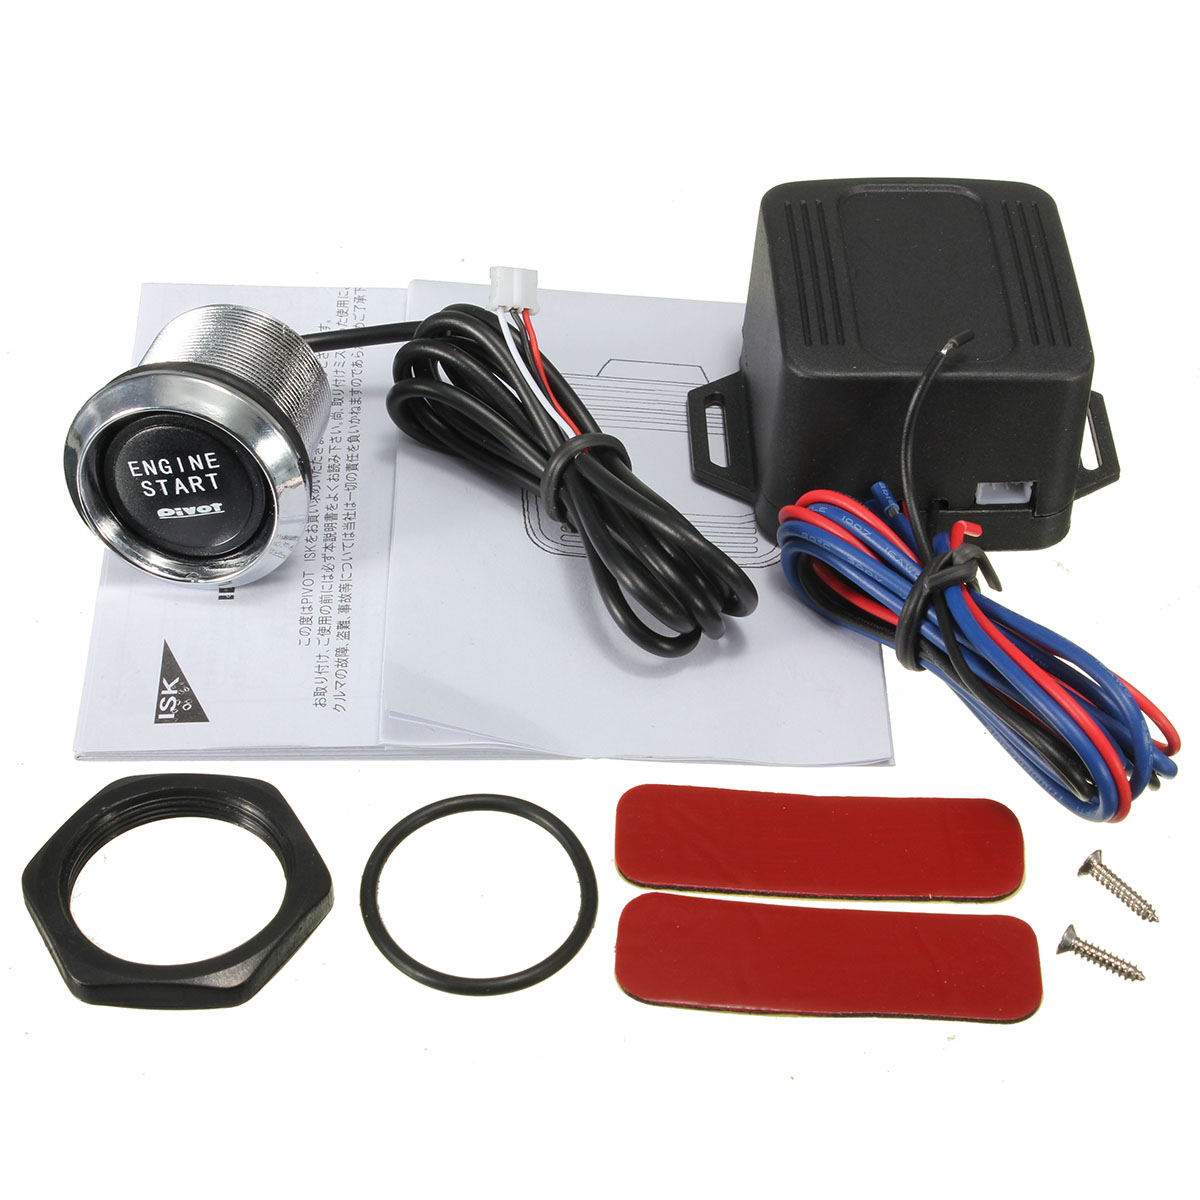 12V Car Engine Start Push Button Momentary Switch Ignition Starter Kit Blue